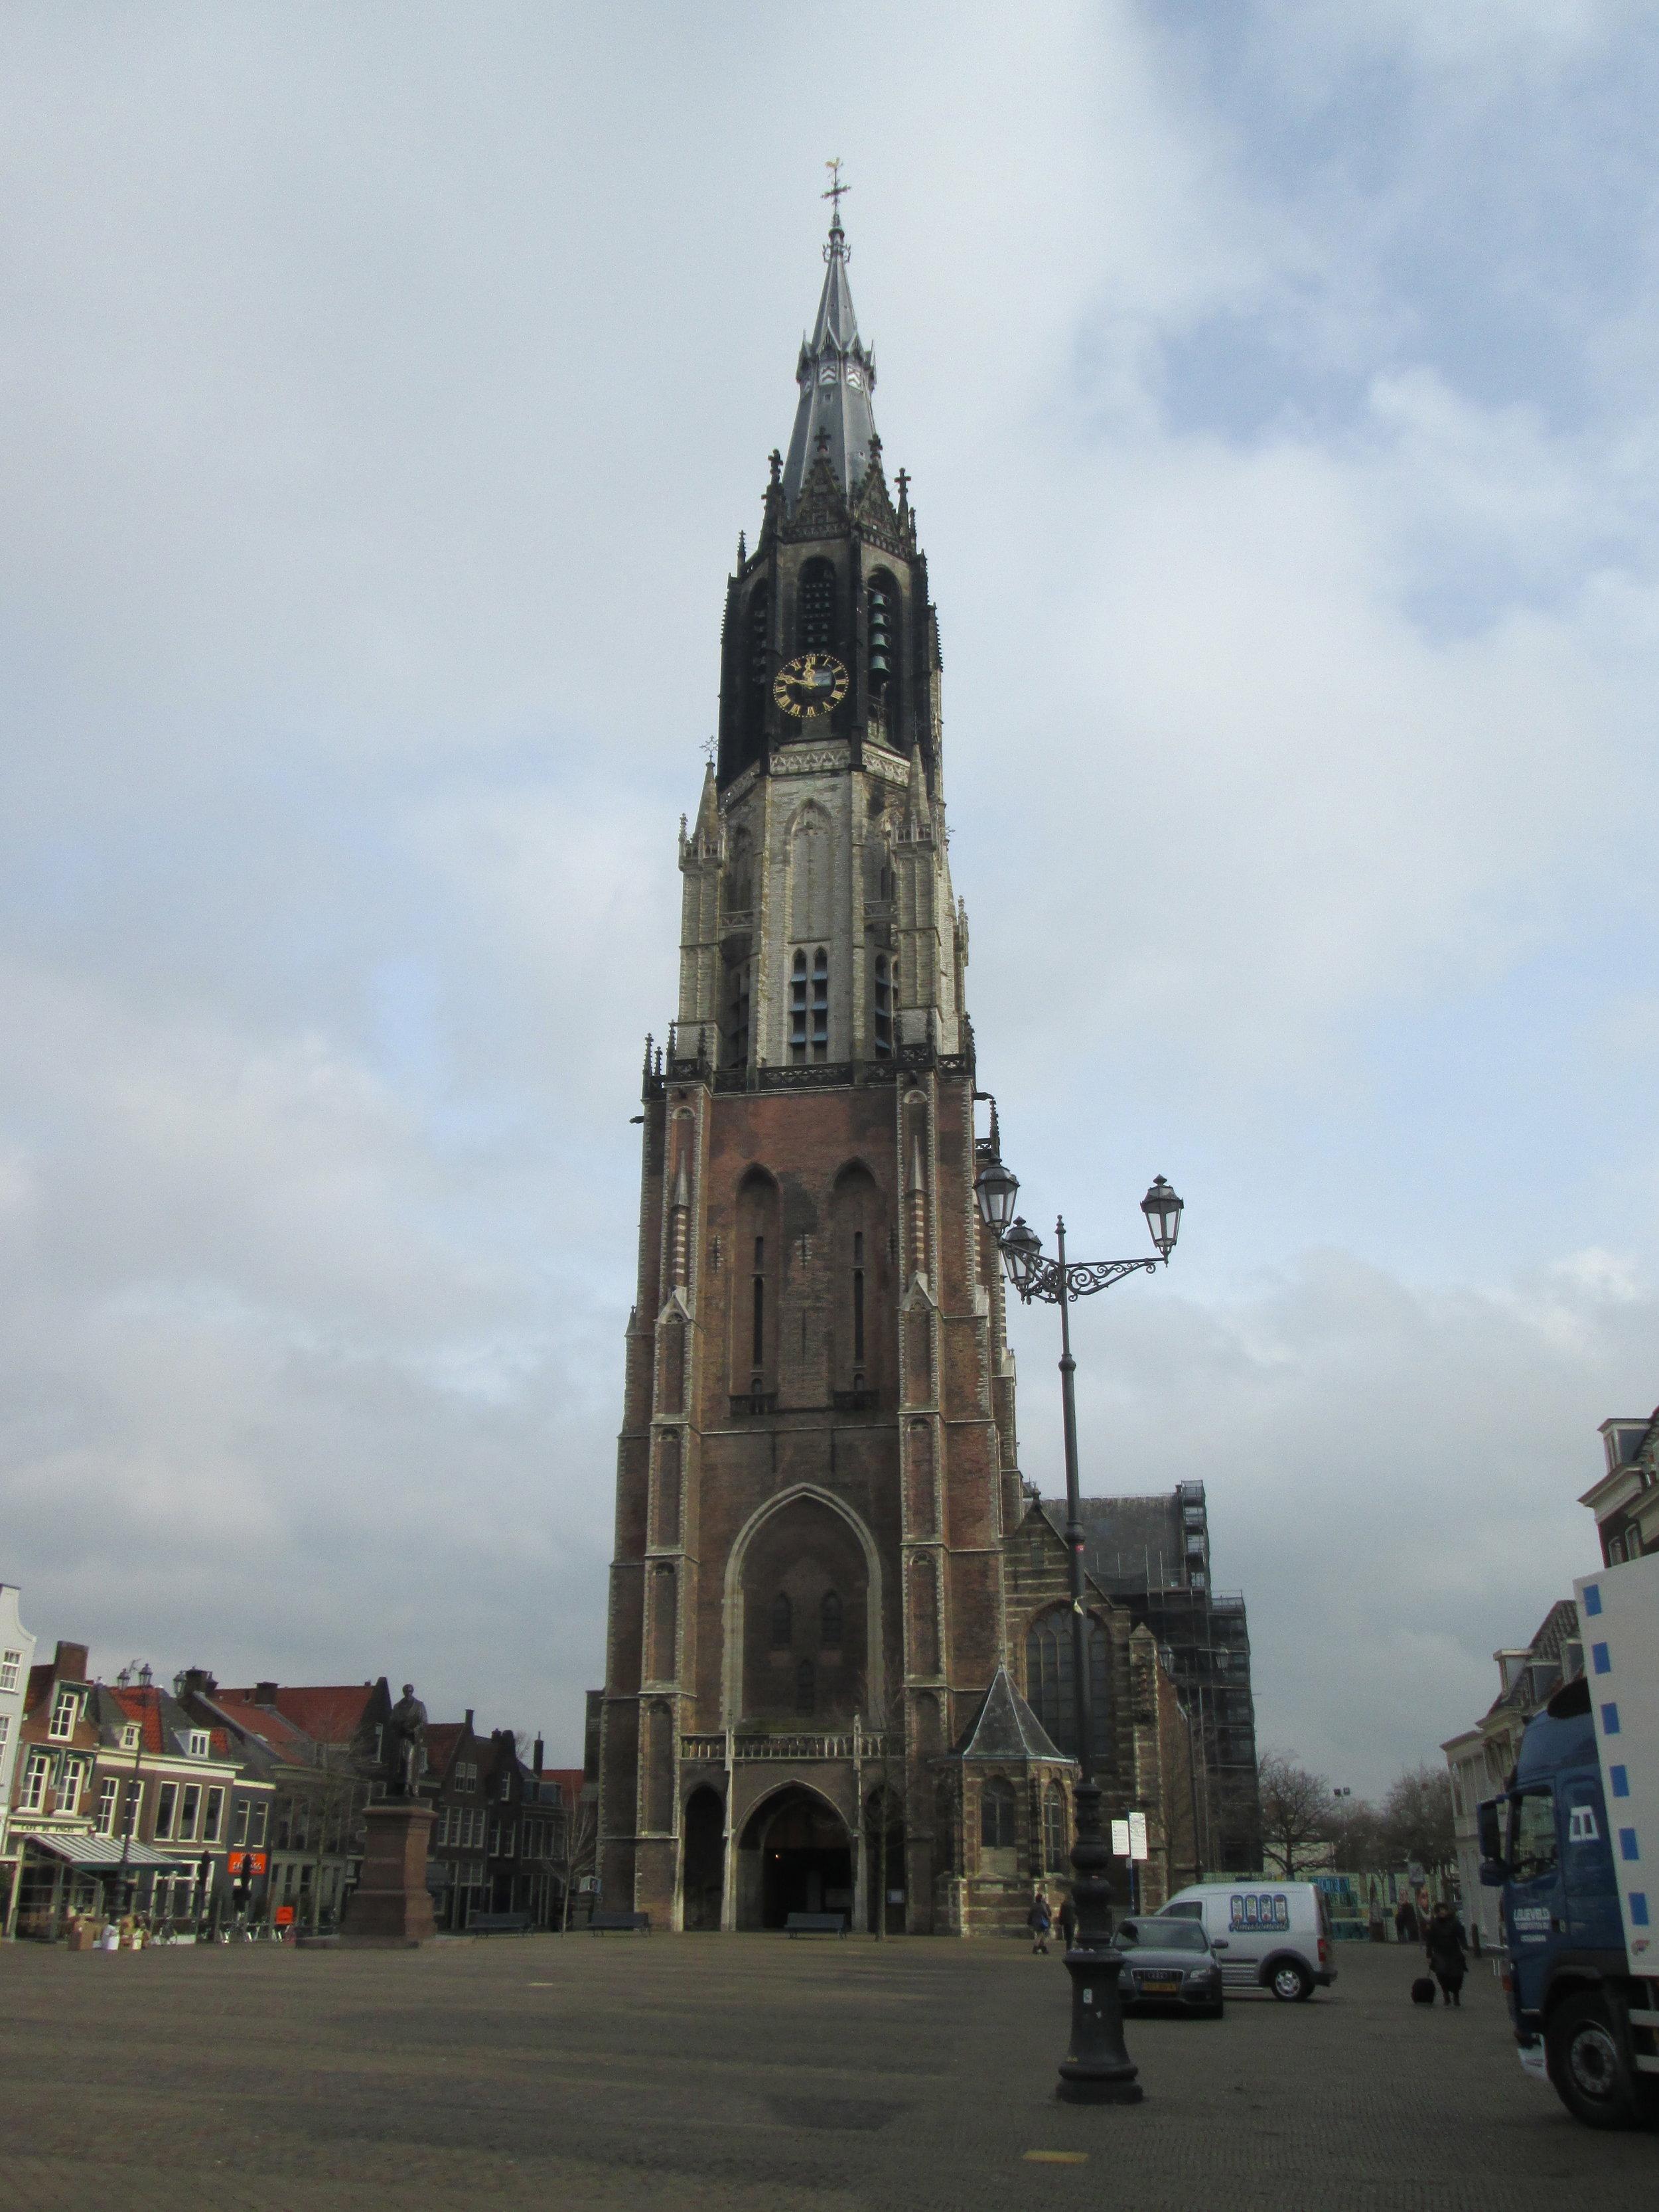 The New Church of Delft